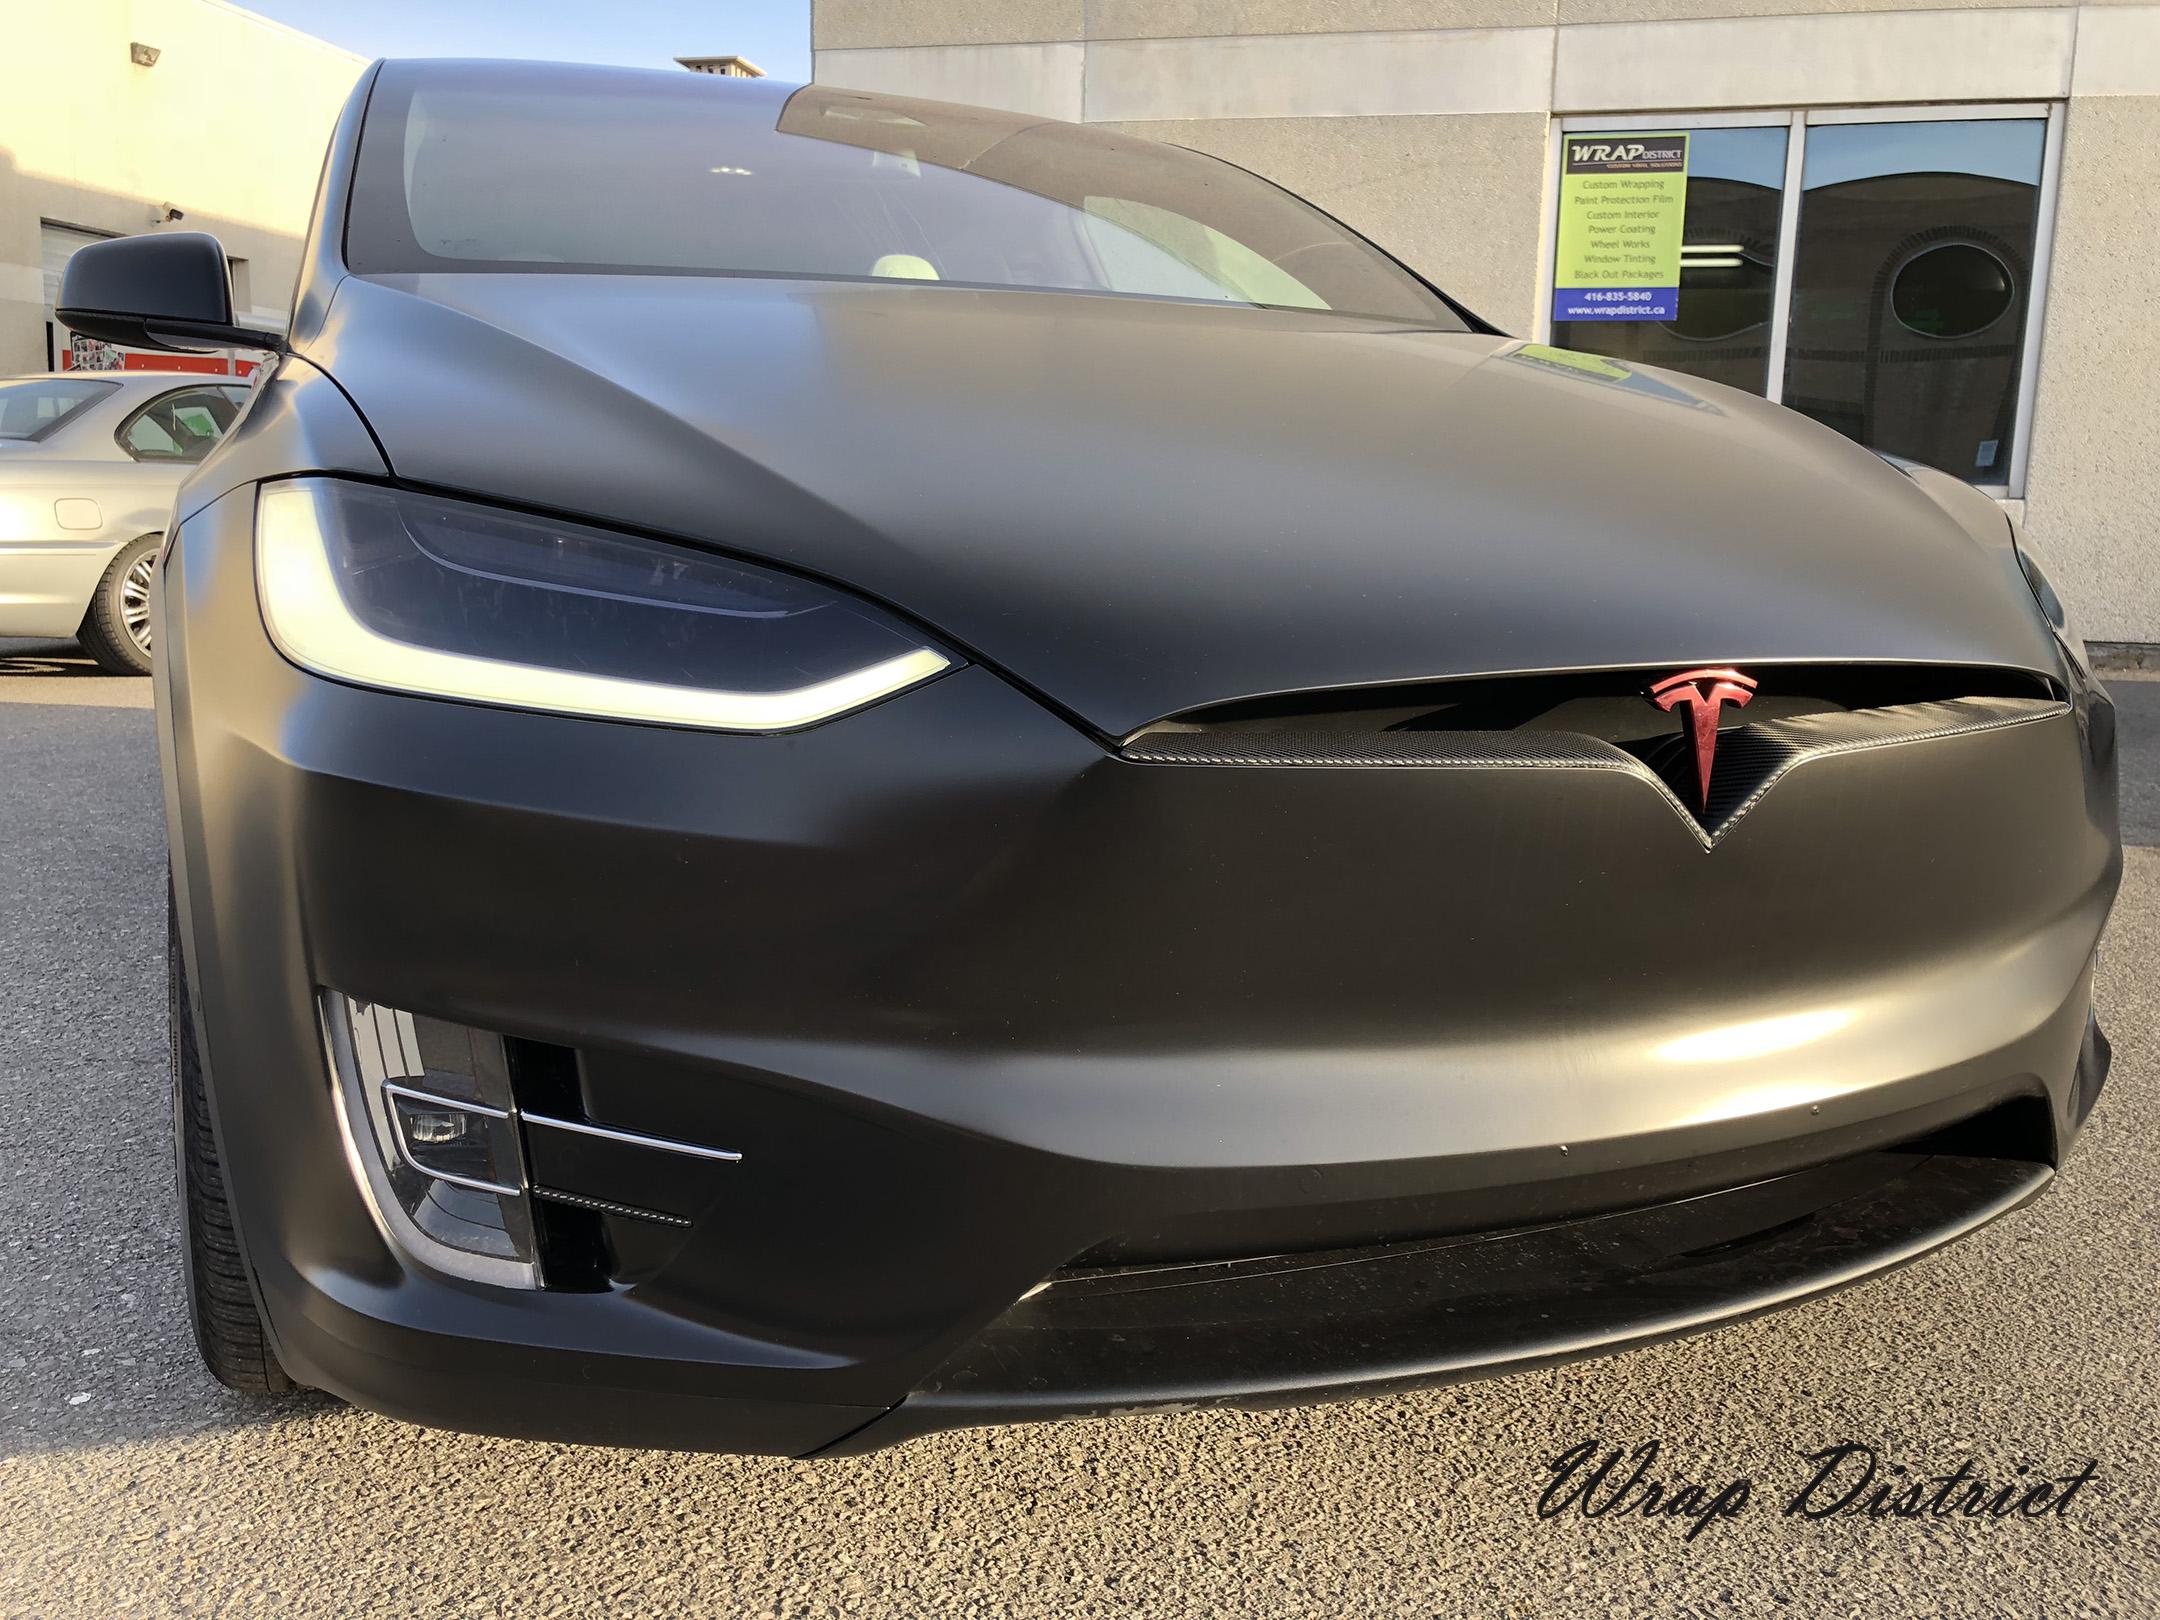 Tesla Model X Wrapped In Satin Black Wrap District